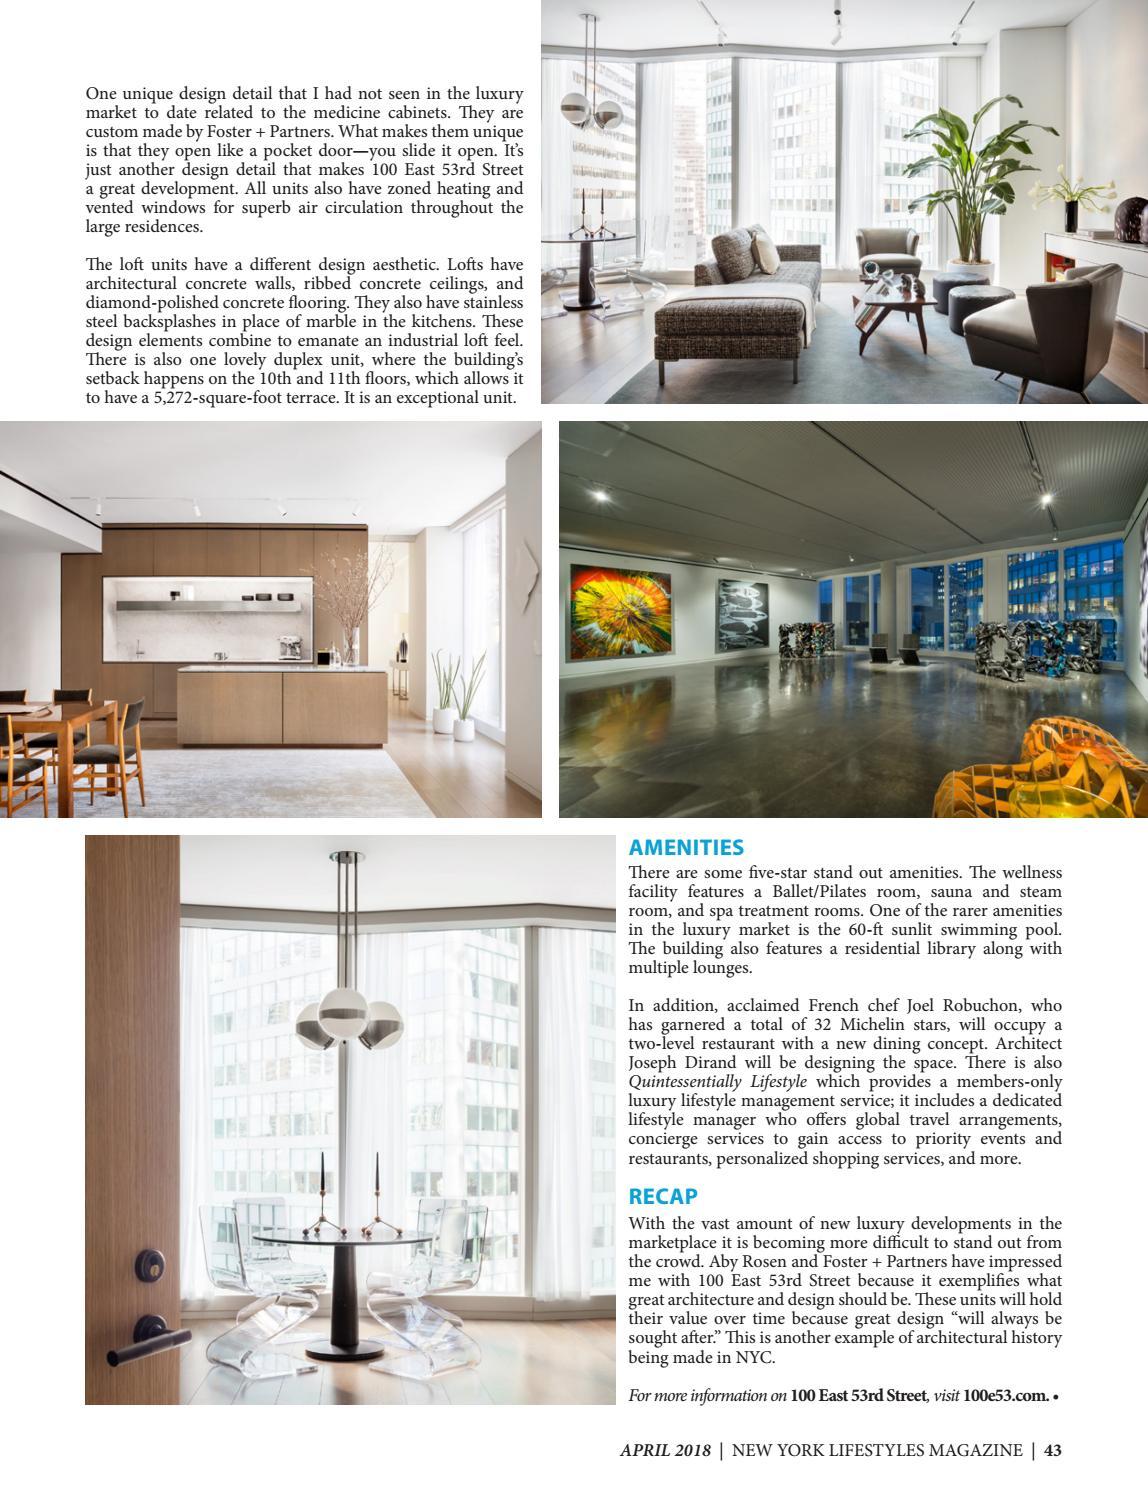 New York Lifestyles Magazine - April 2018 by New York Lifestyles